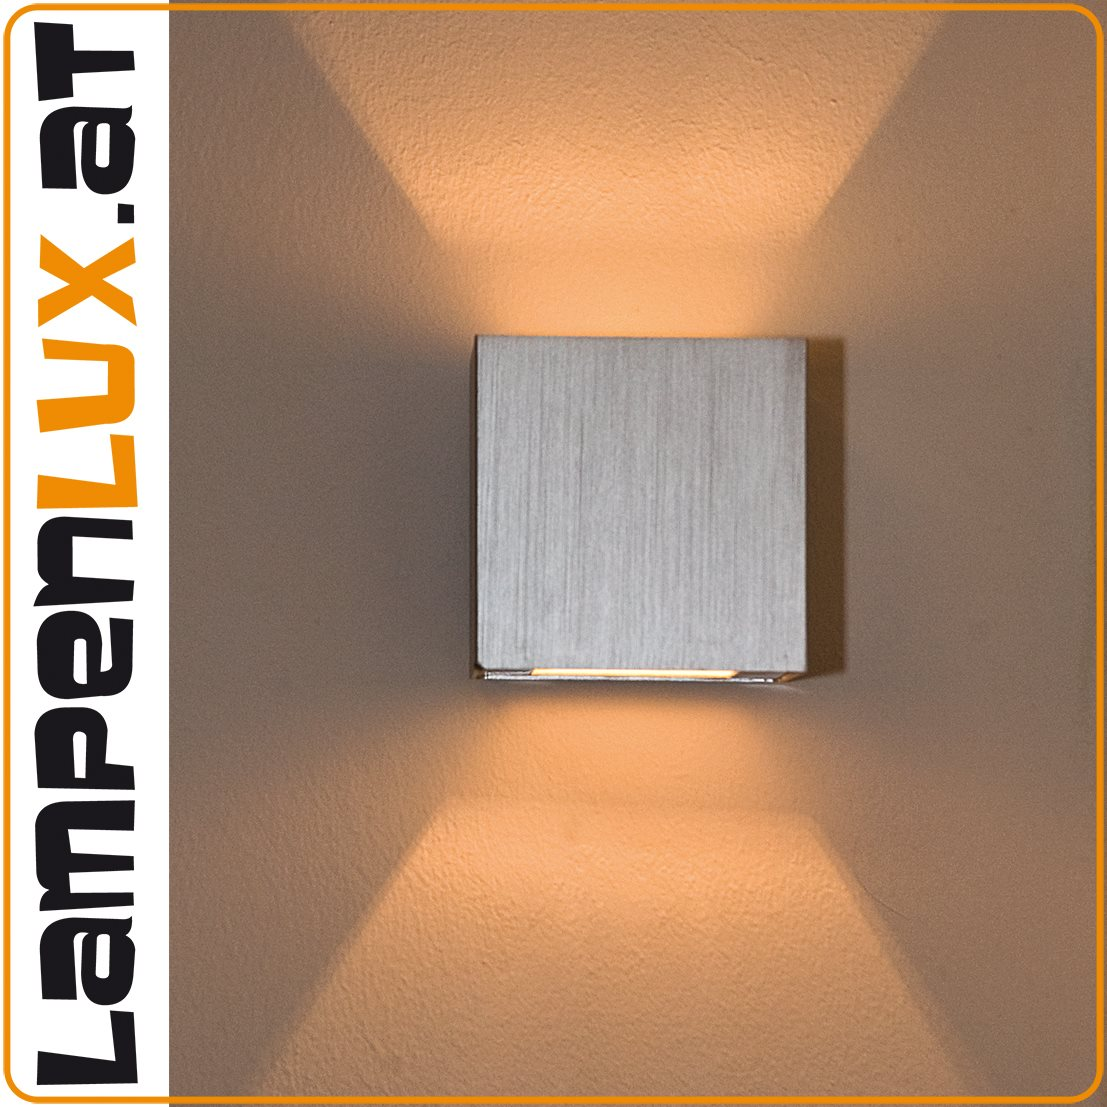 Lampenlux LED Up/Down Wandleuchte Wandlampe Amon breit-breit Stimmungslicht silber G9 4W